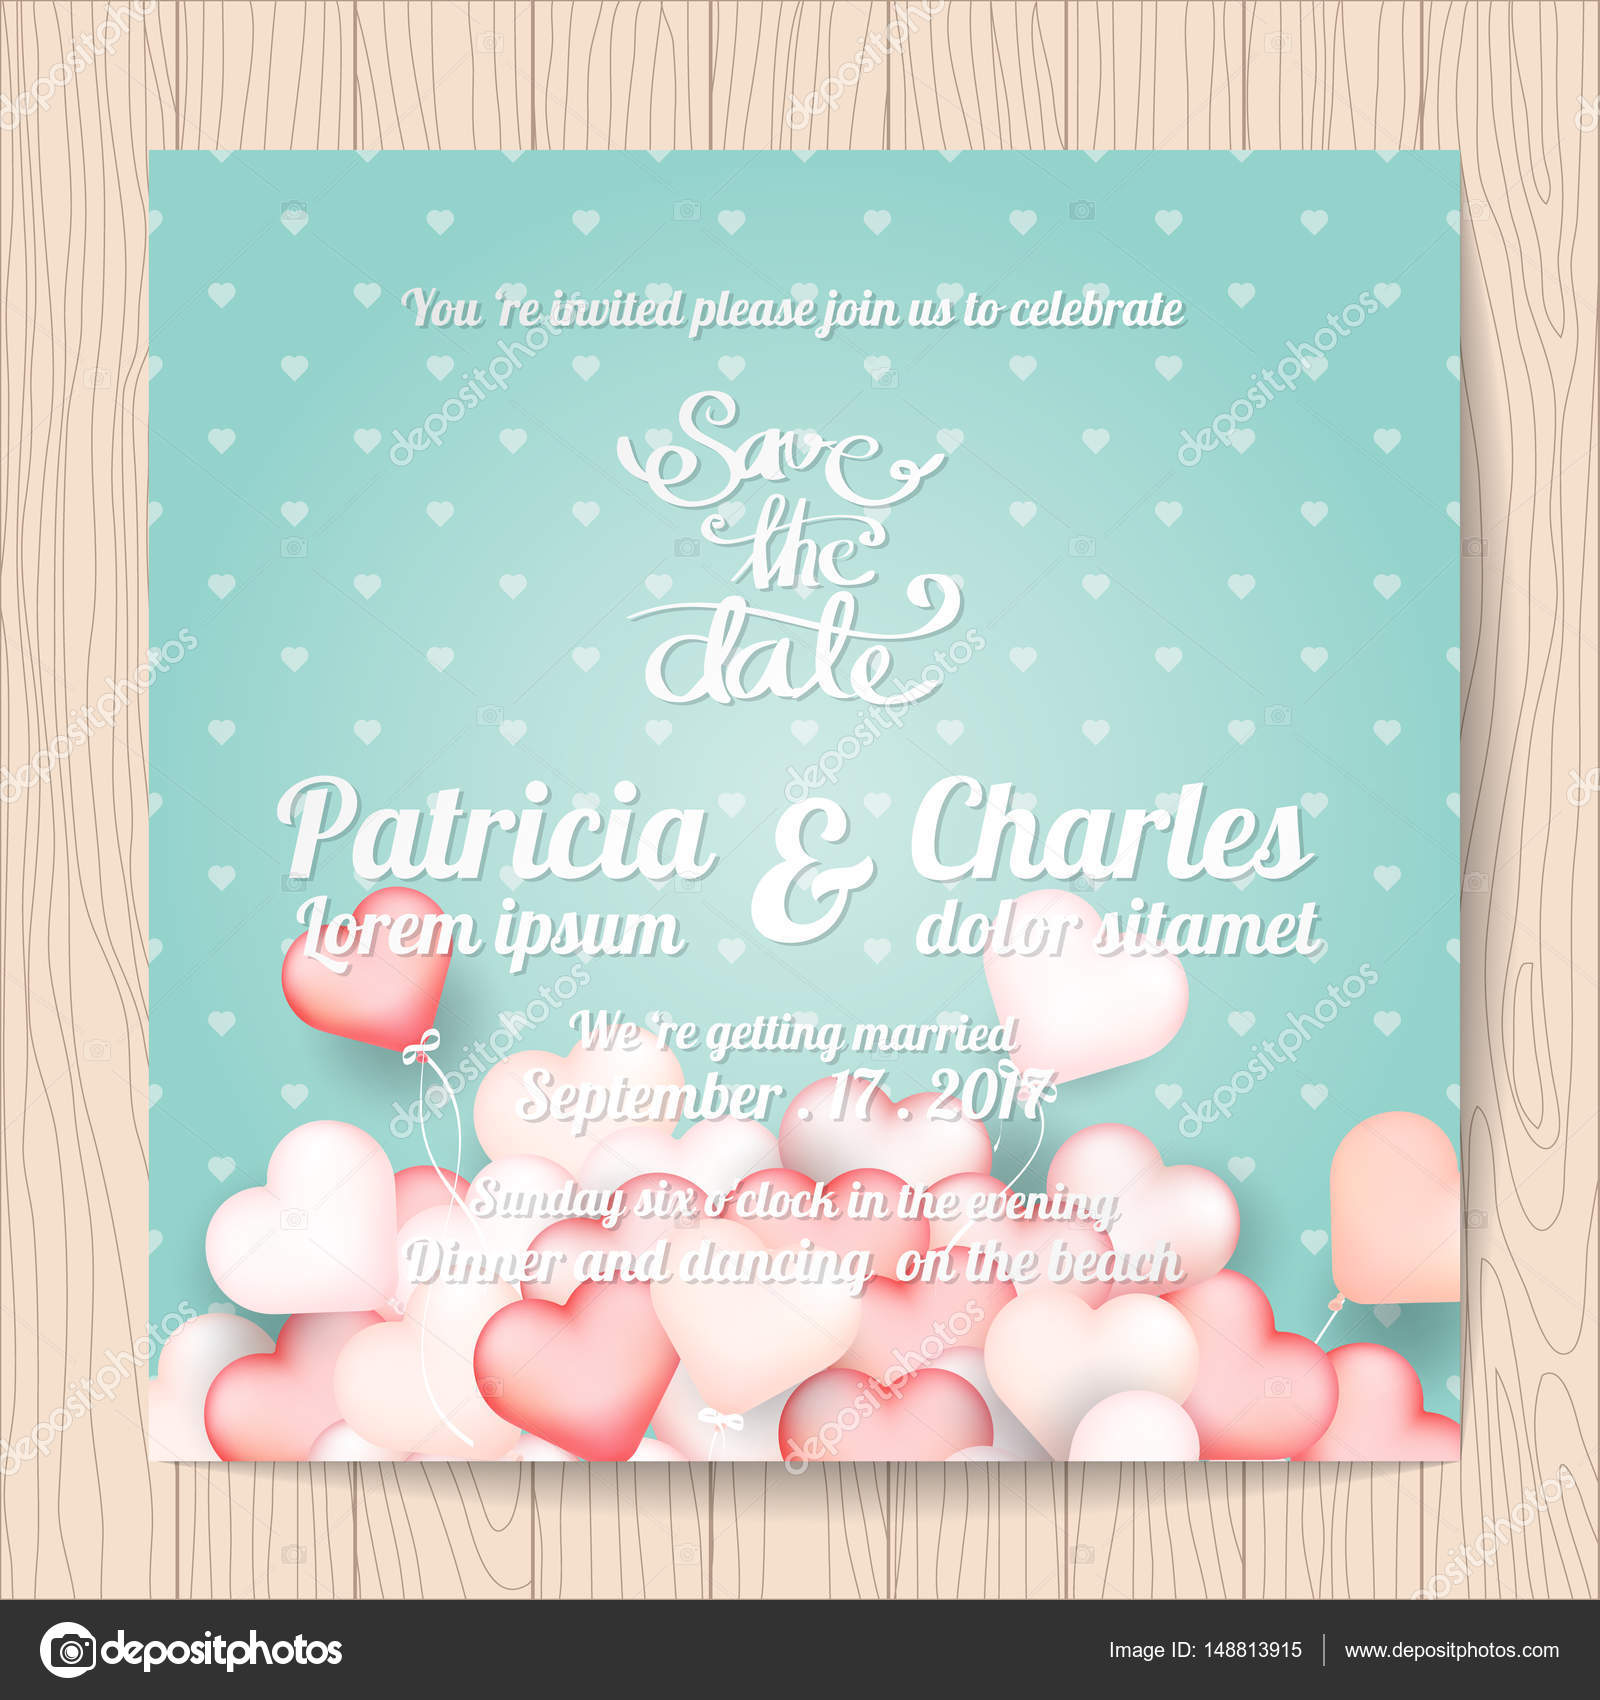 Wedding invitation card templates Sweet heart balloon backgroun